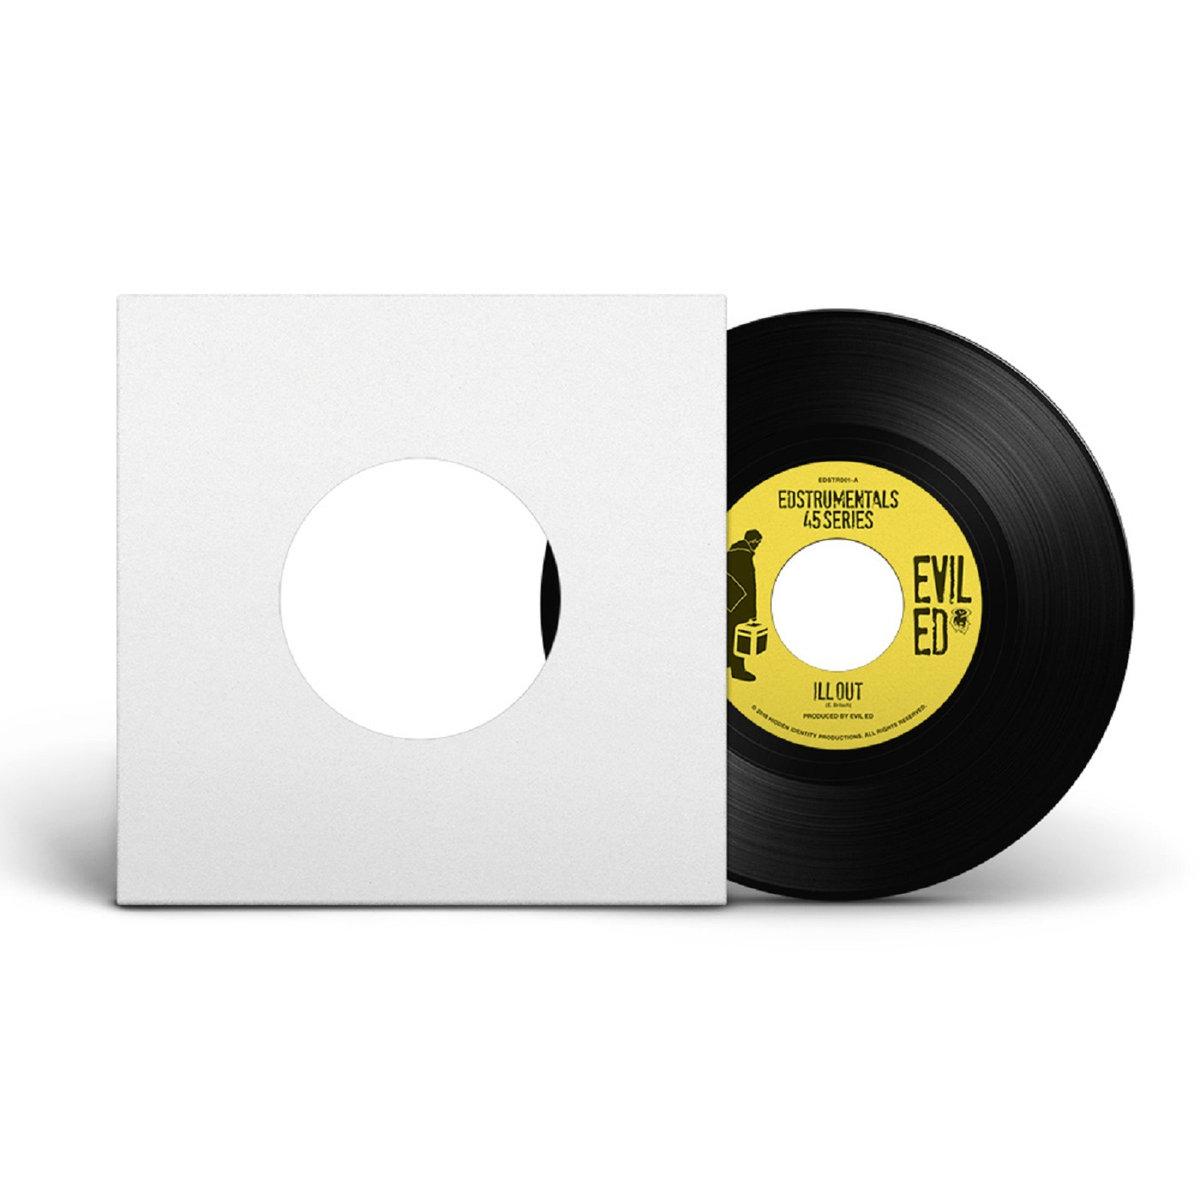 No Words #20: Cavalier, Lipp der Funkverteiler, Soulpete, Evil Ed & Blue Lab Beats